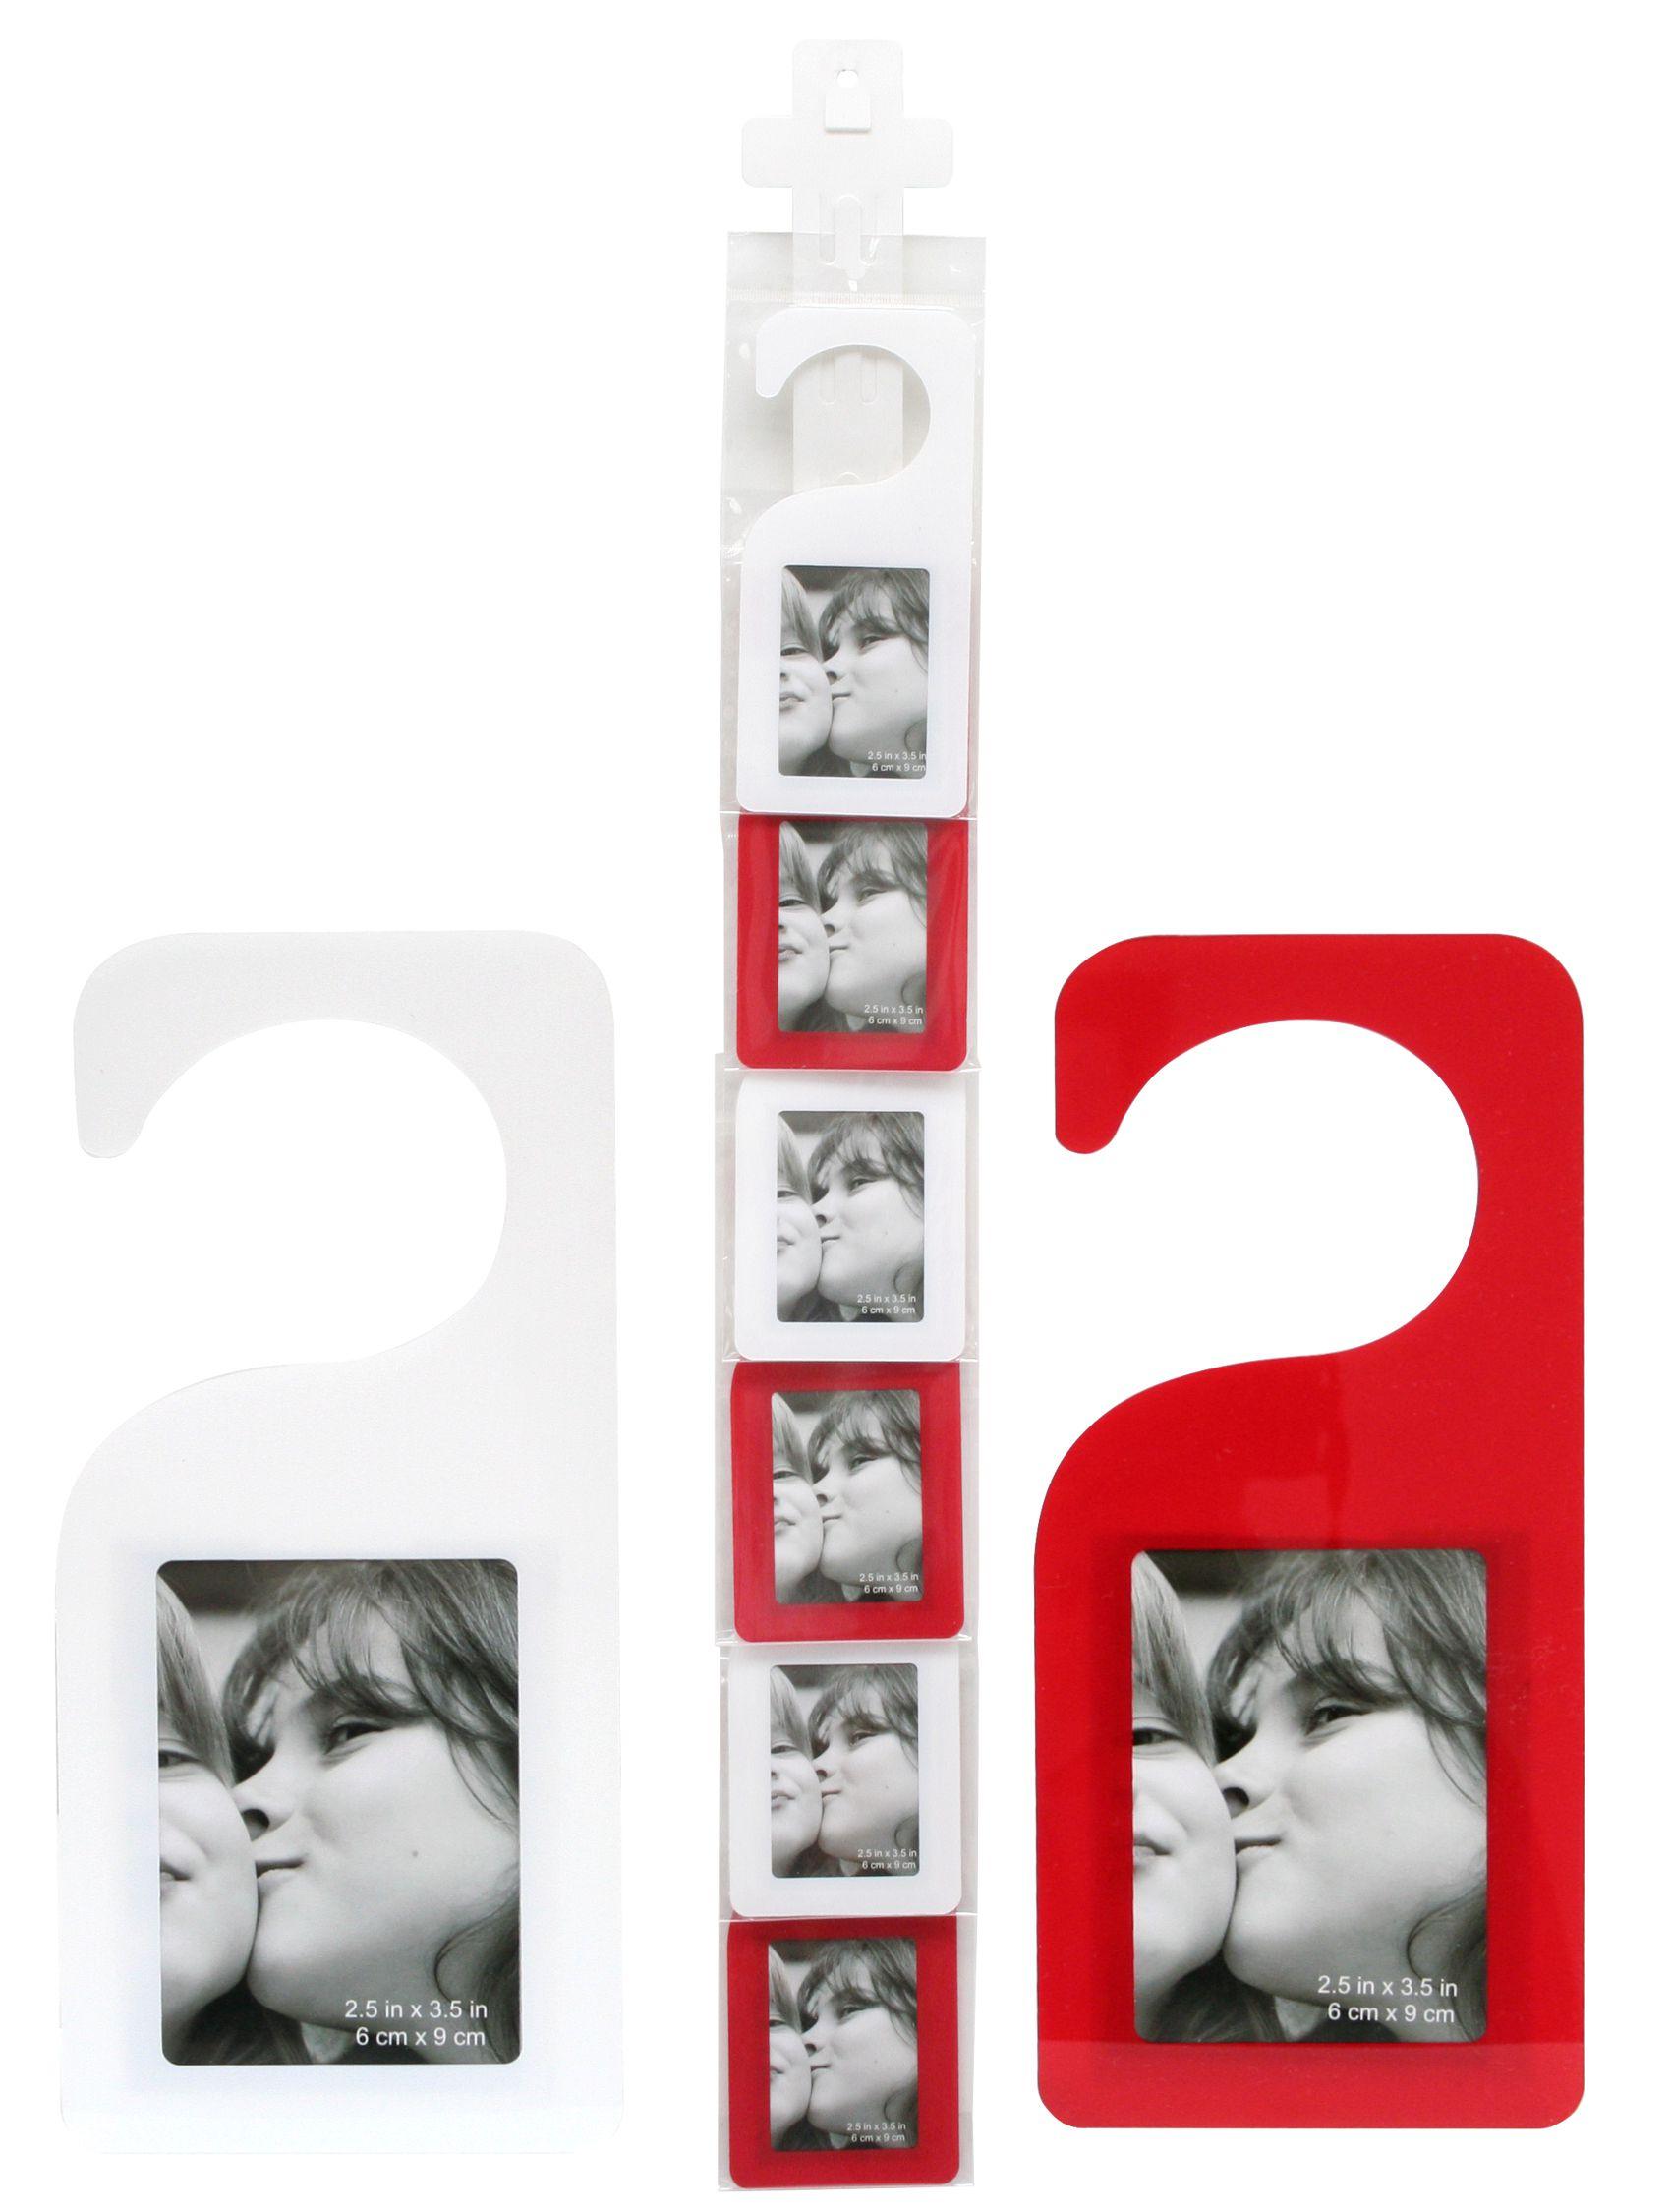 Plexi fotodeurhanger, wit of rood, 20cm hoog S58RH5